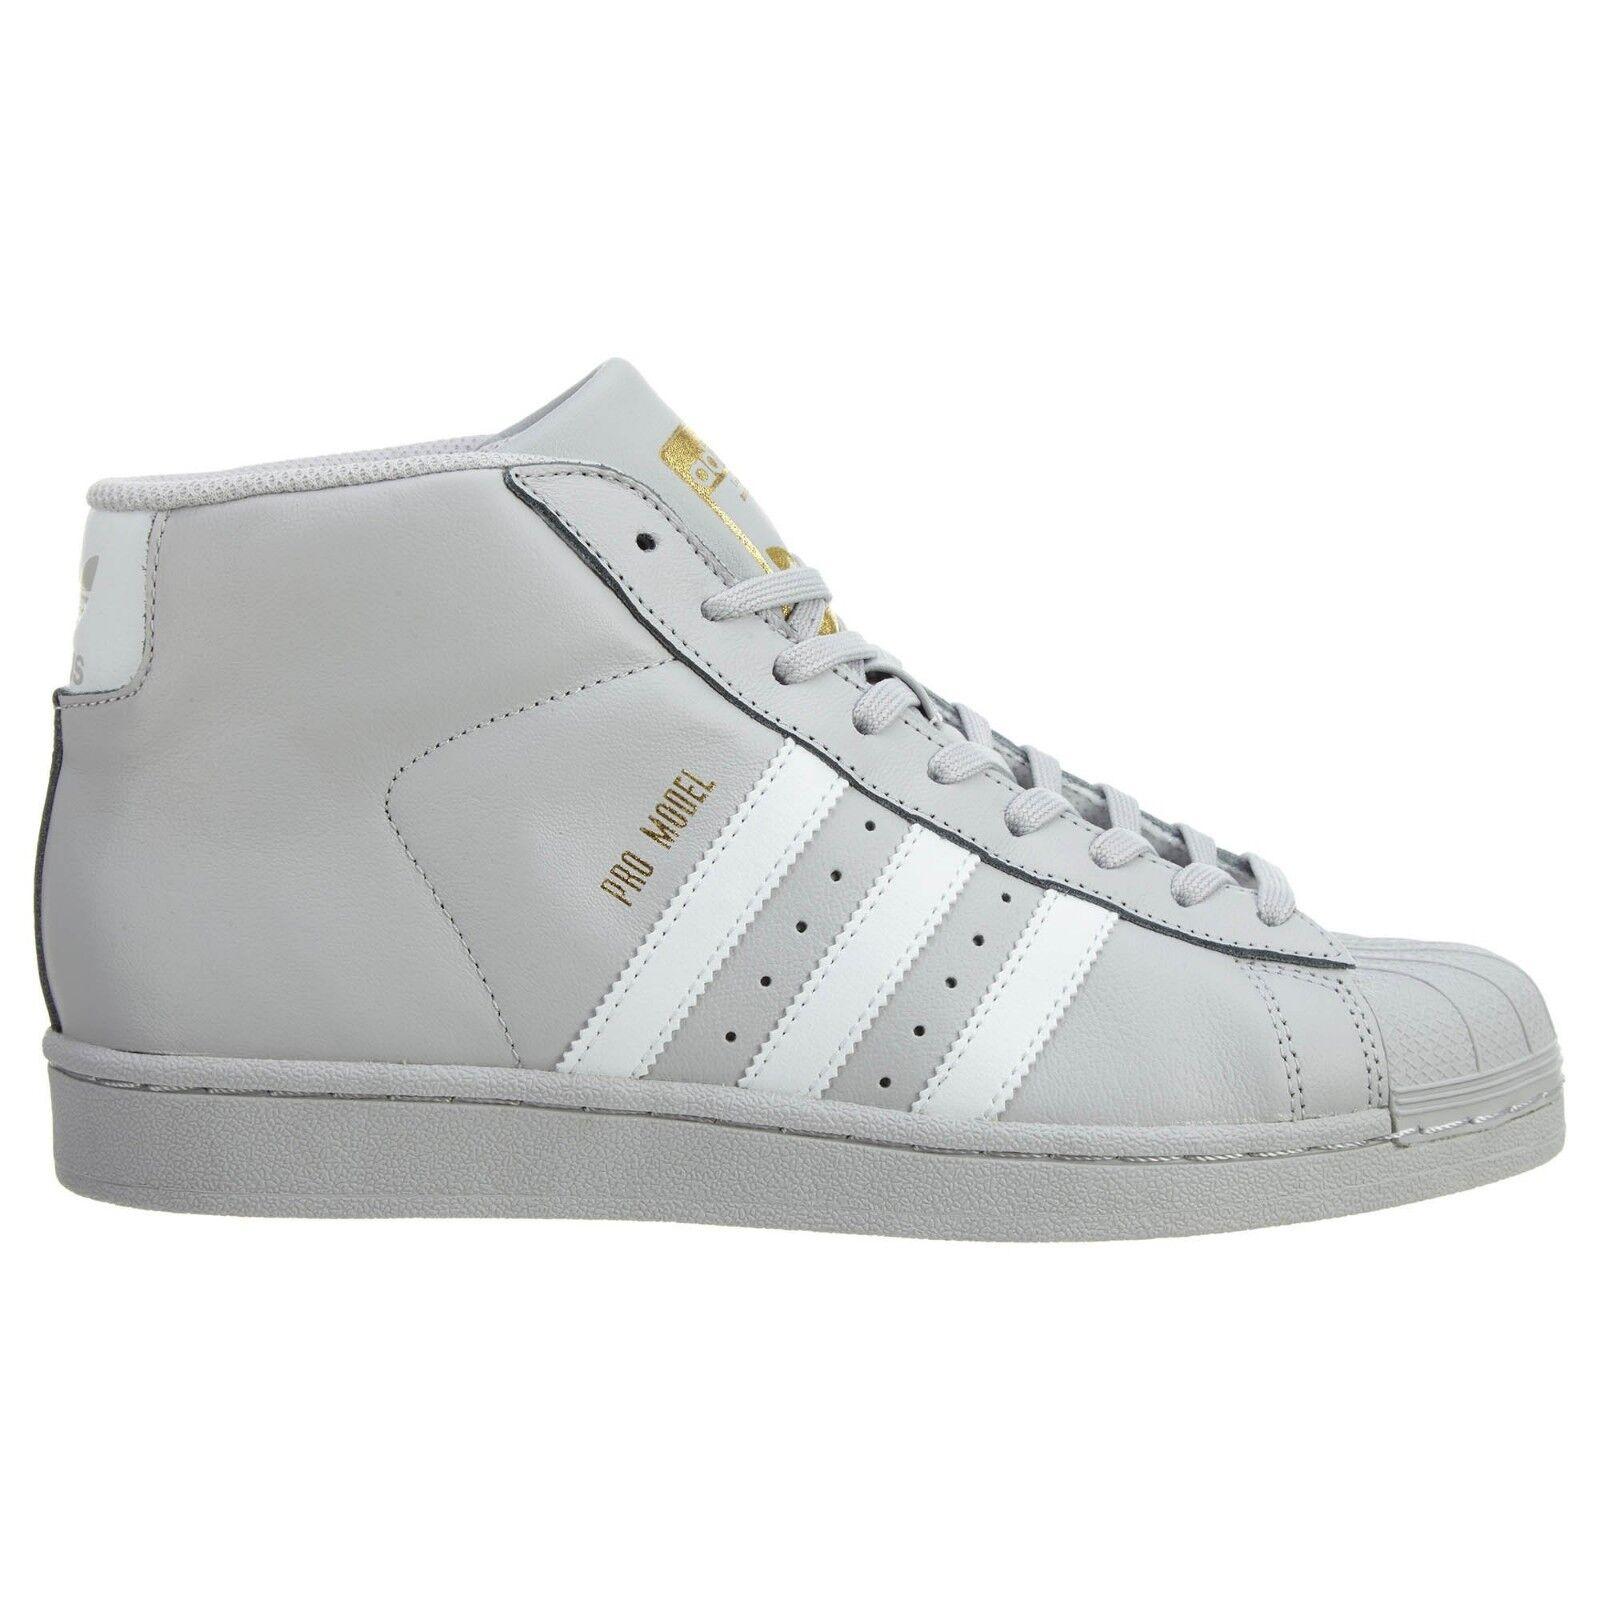 Adidas Originals Men's PRO MODEL shoes Grey White gold Metallic CG5073 b